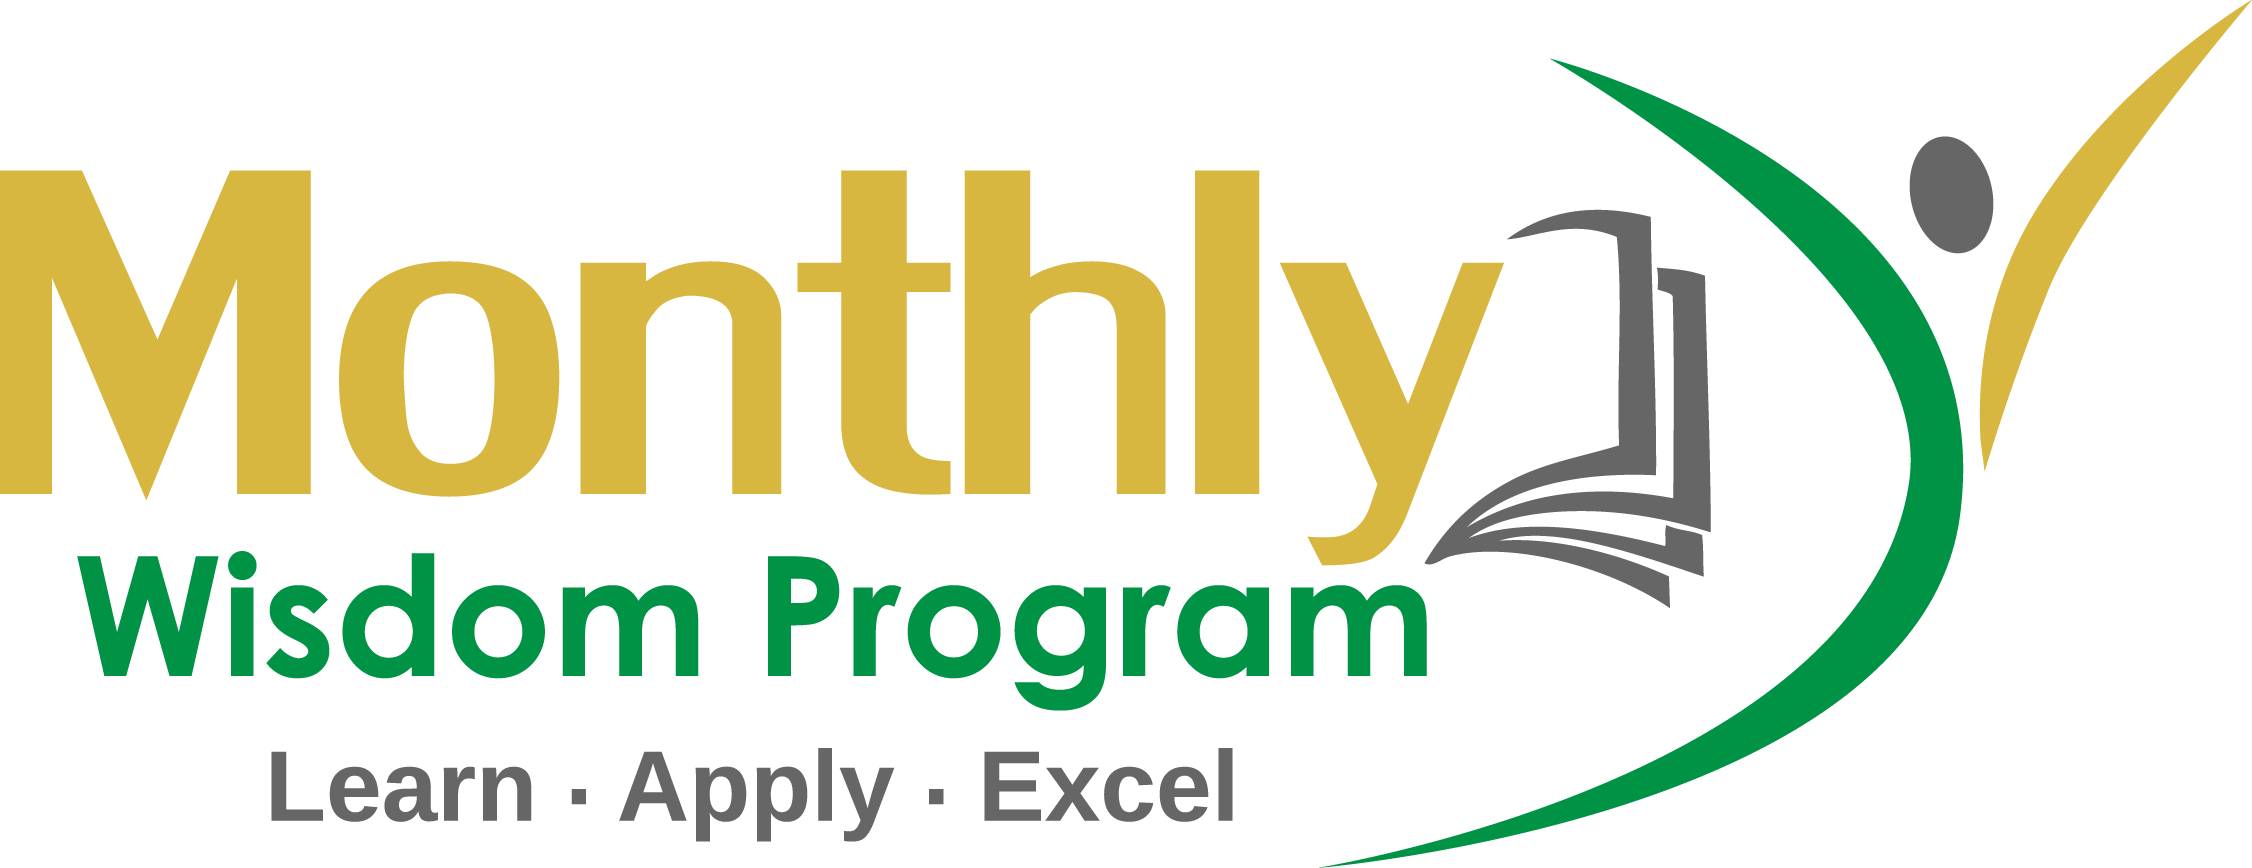 Monthly Wisdom Program